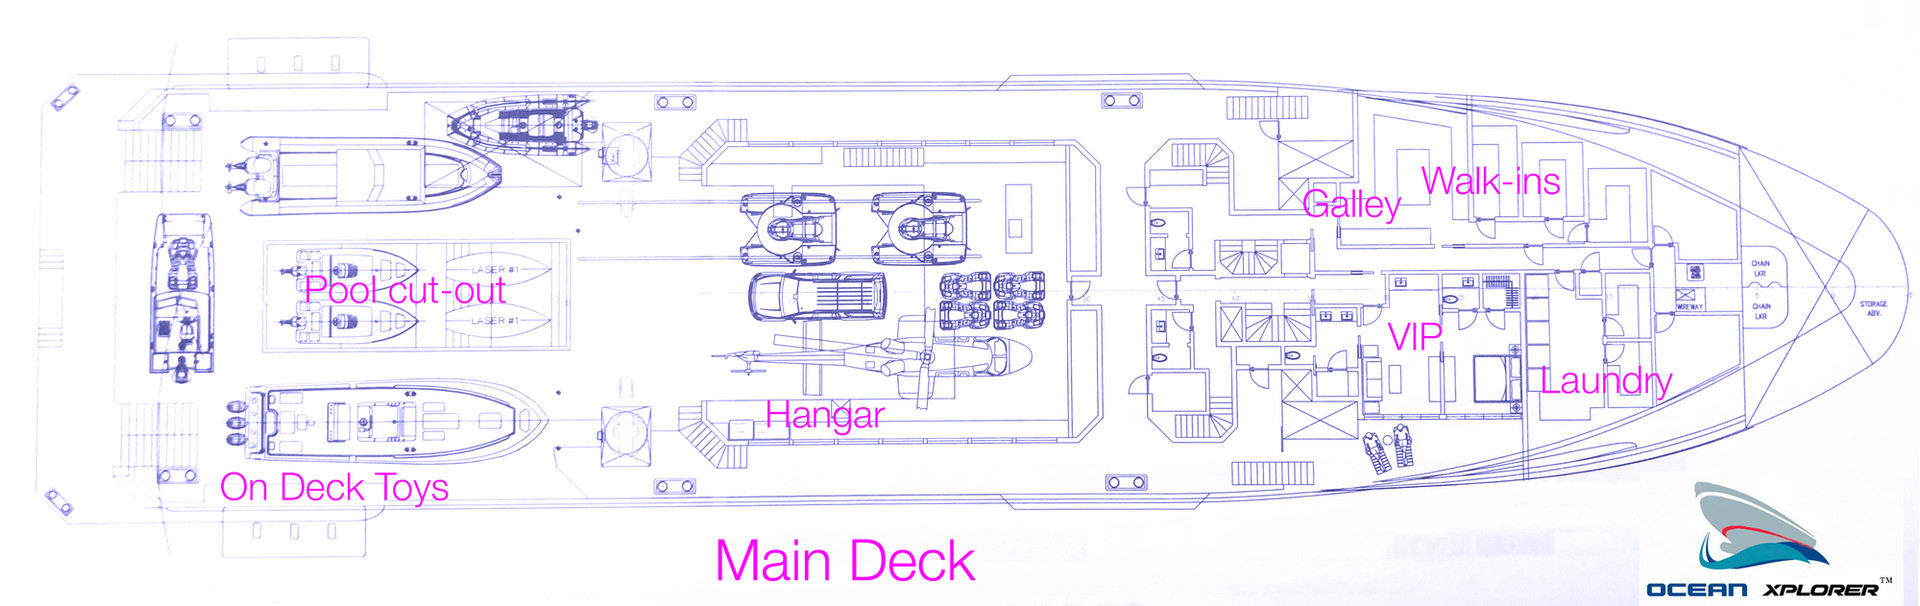 Ocean Xplorer 70 Main Deck